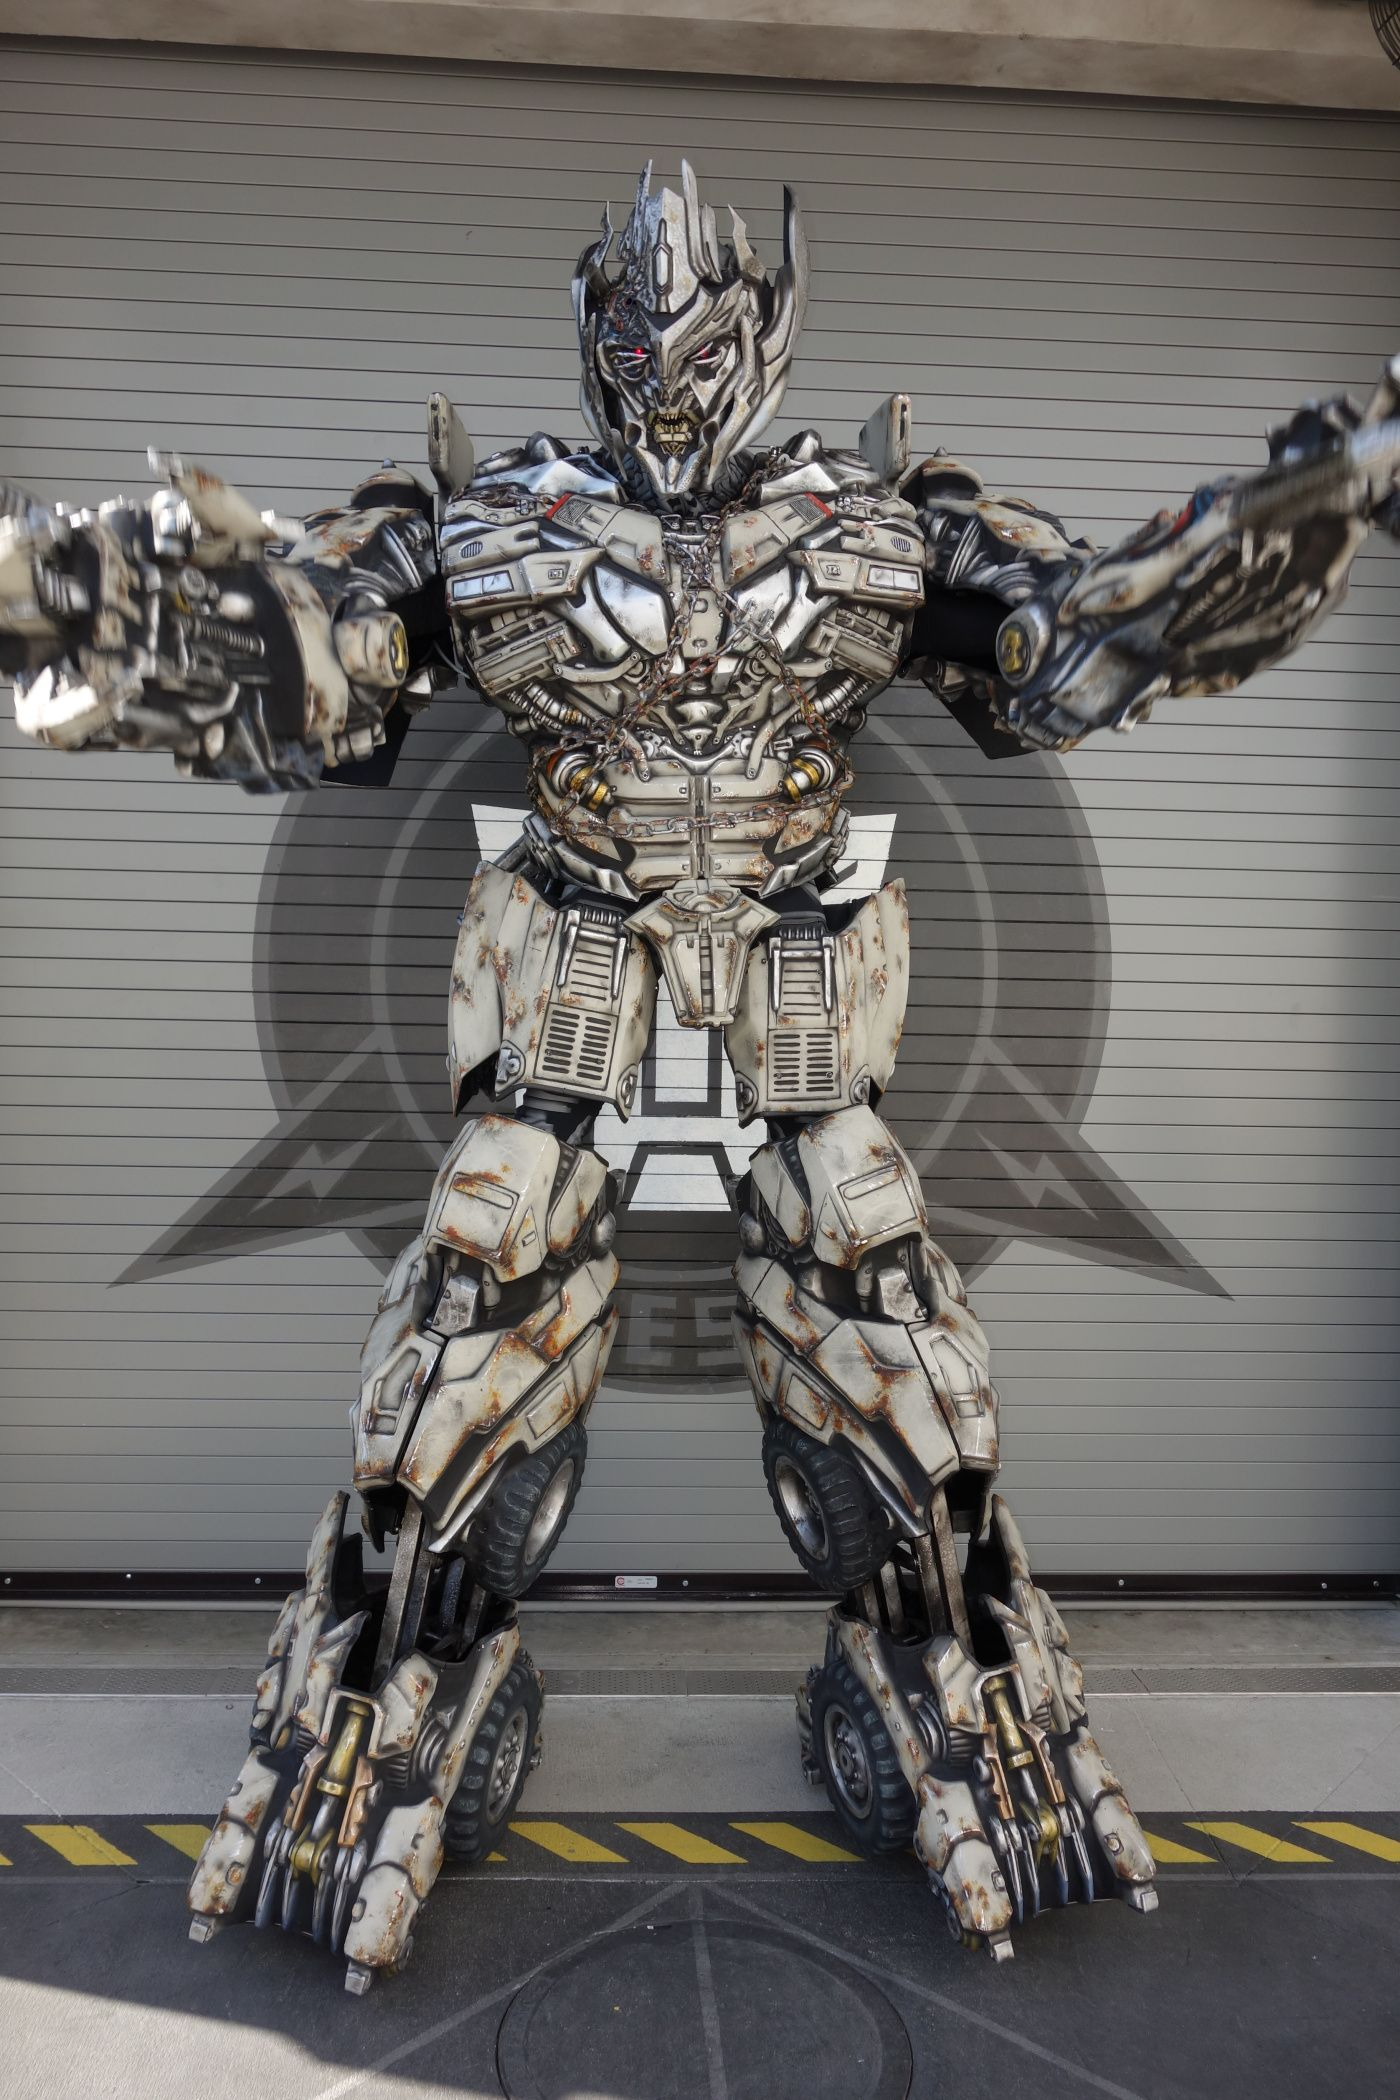 Universal Studios Orlando Transformers Megatron Meet And Greet 5